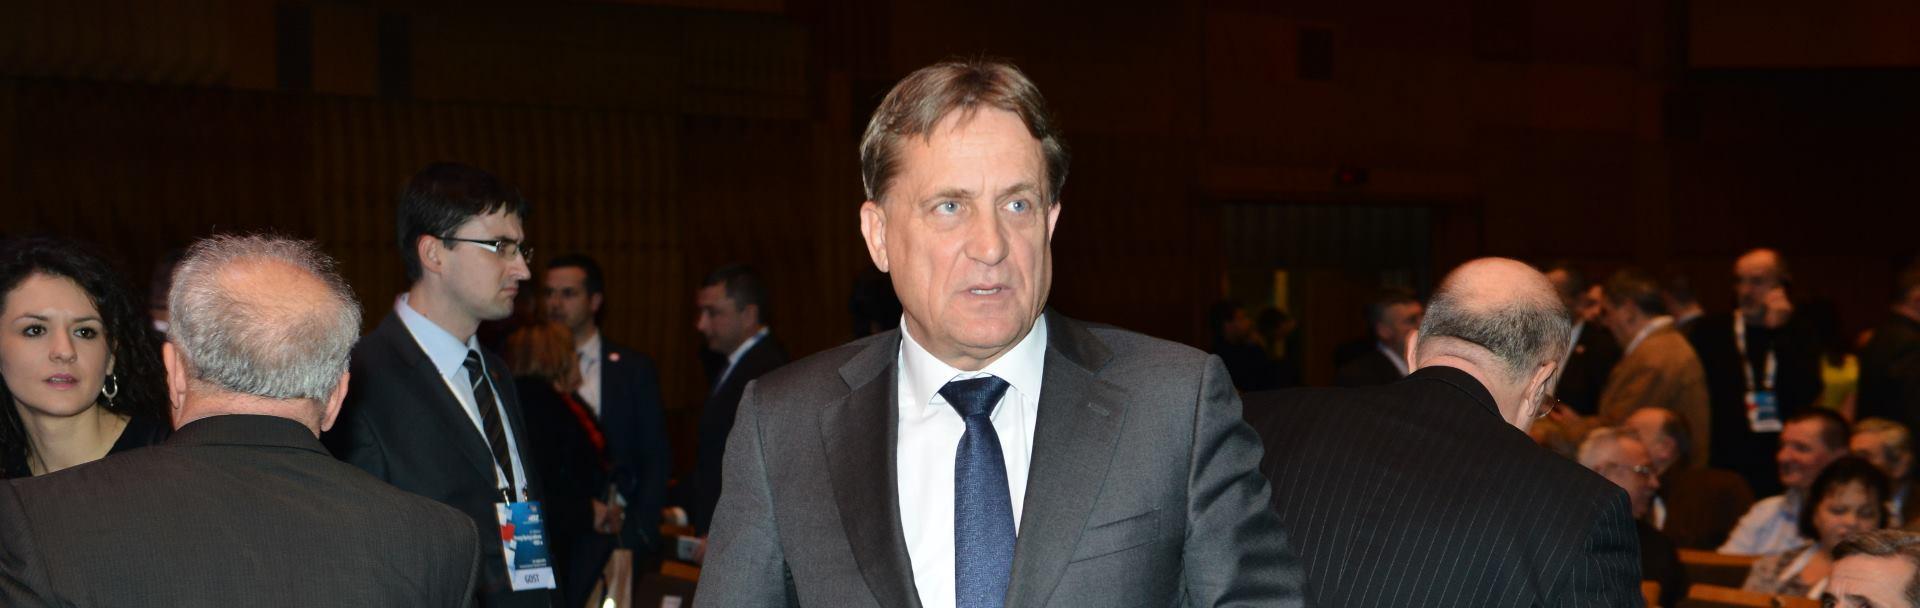 Kalmeta: MOST nema nikakvog razloga surađivati sa SDP-om